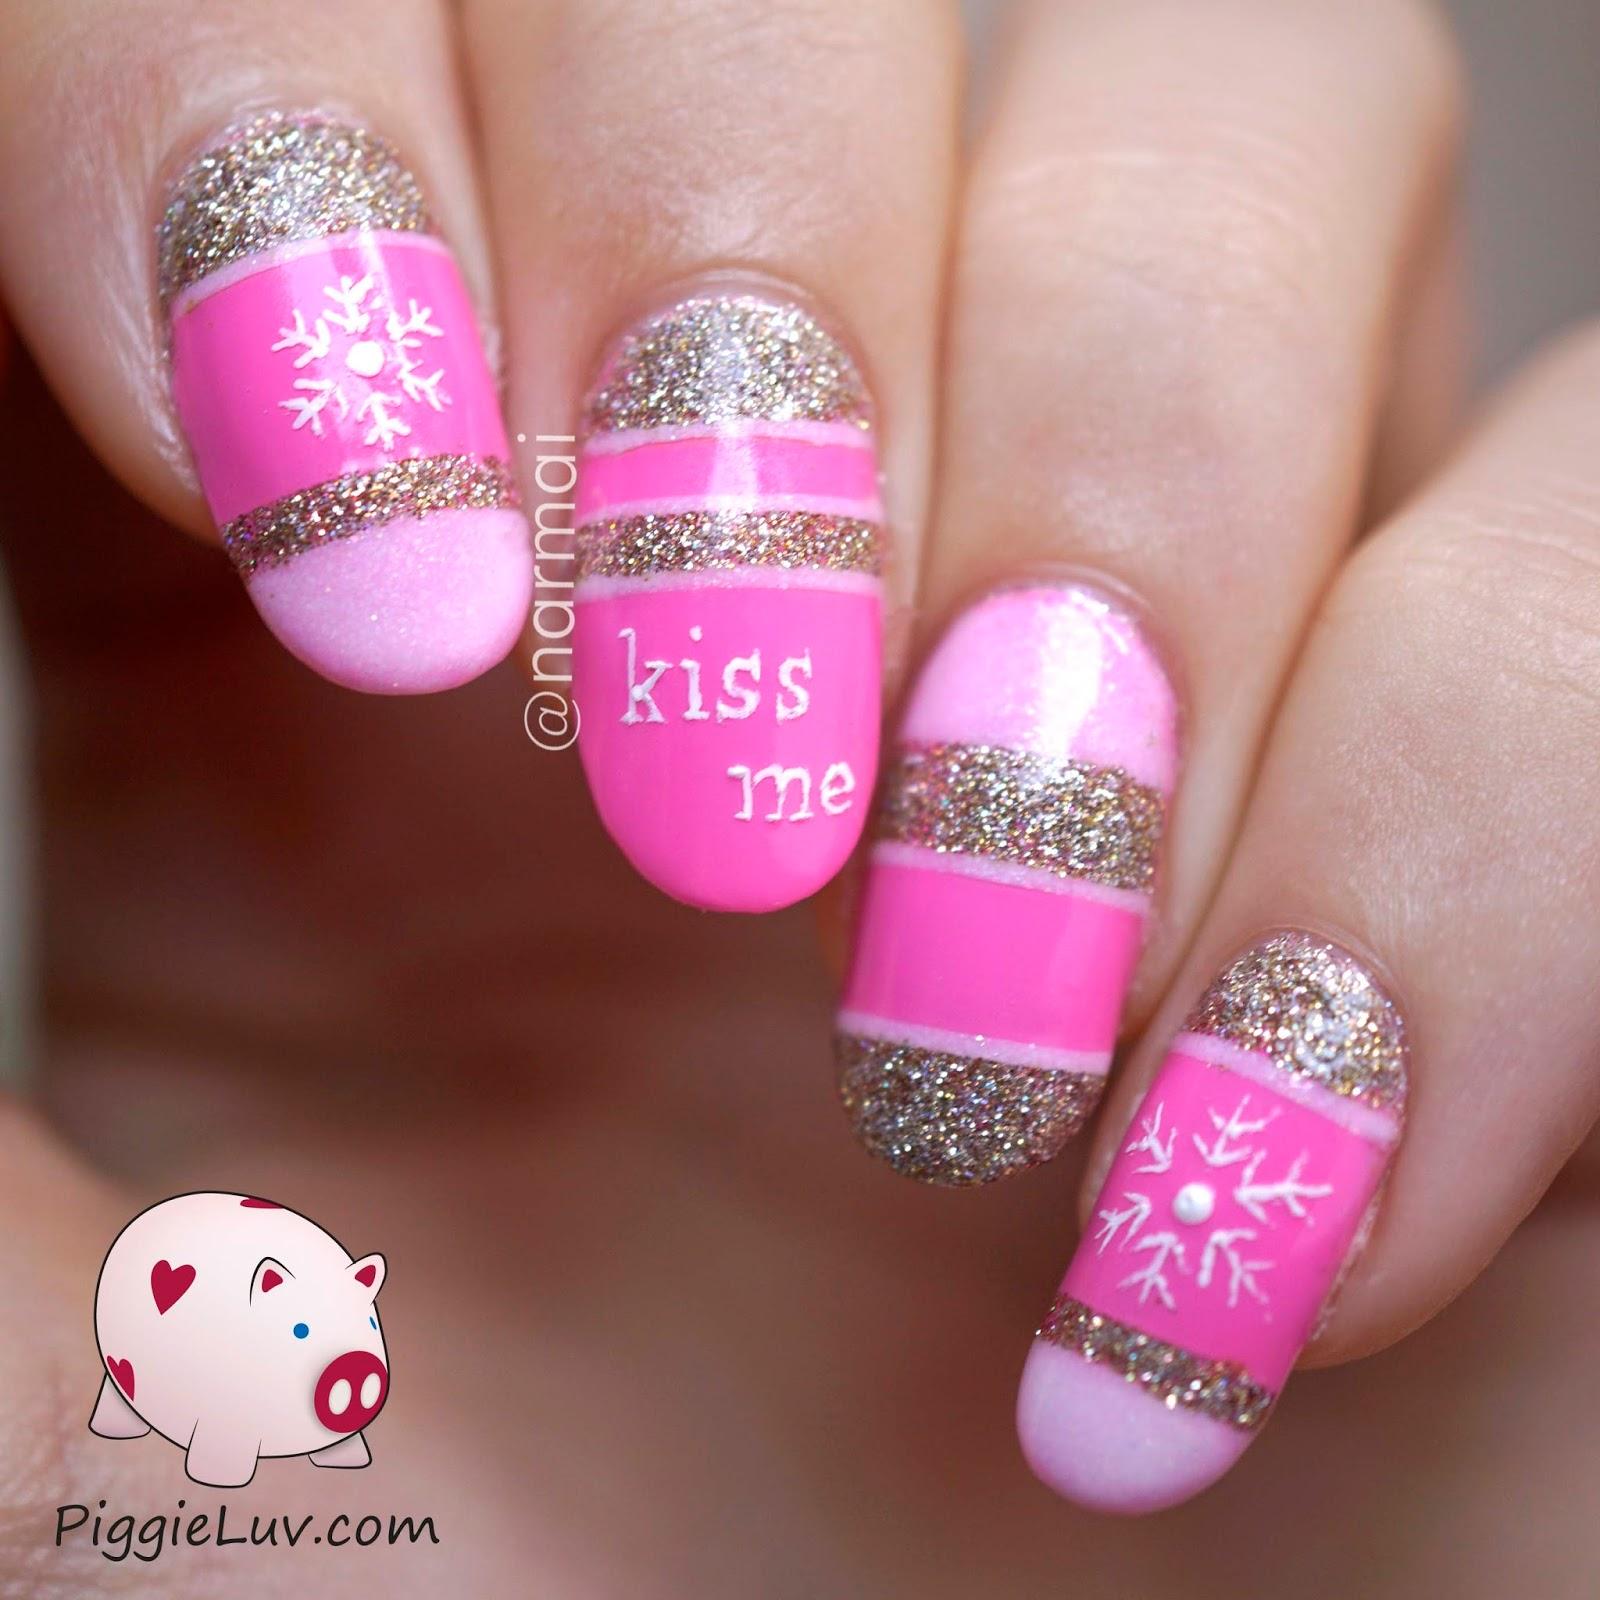 PiggieLuv: Kiss me nail art (with snowflakes)